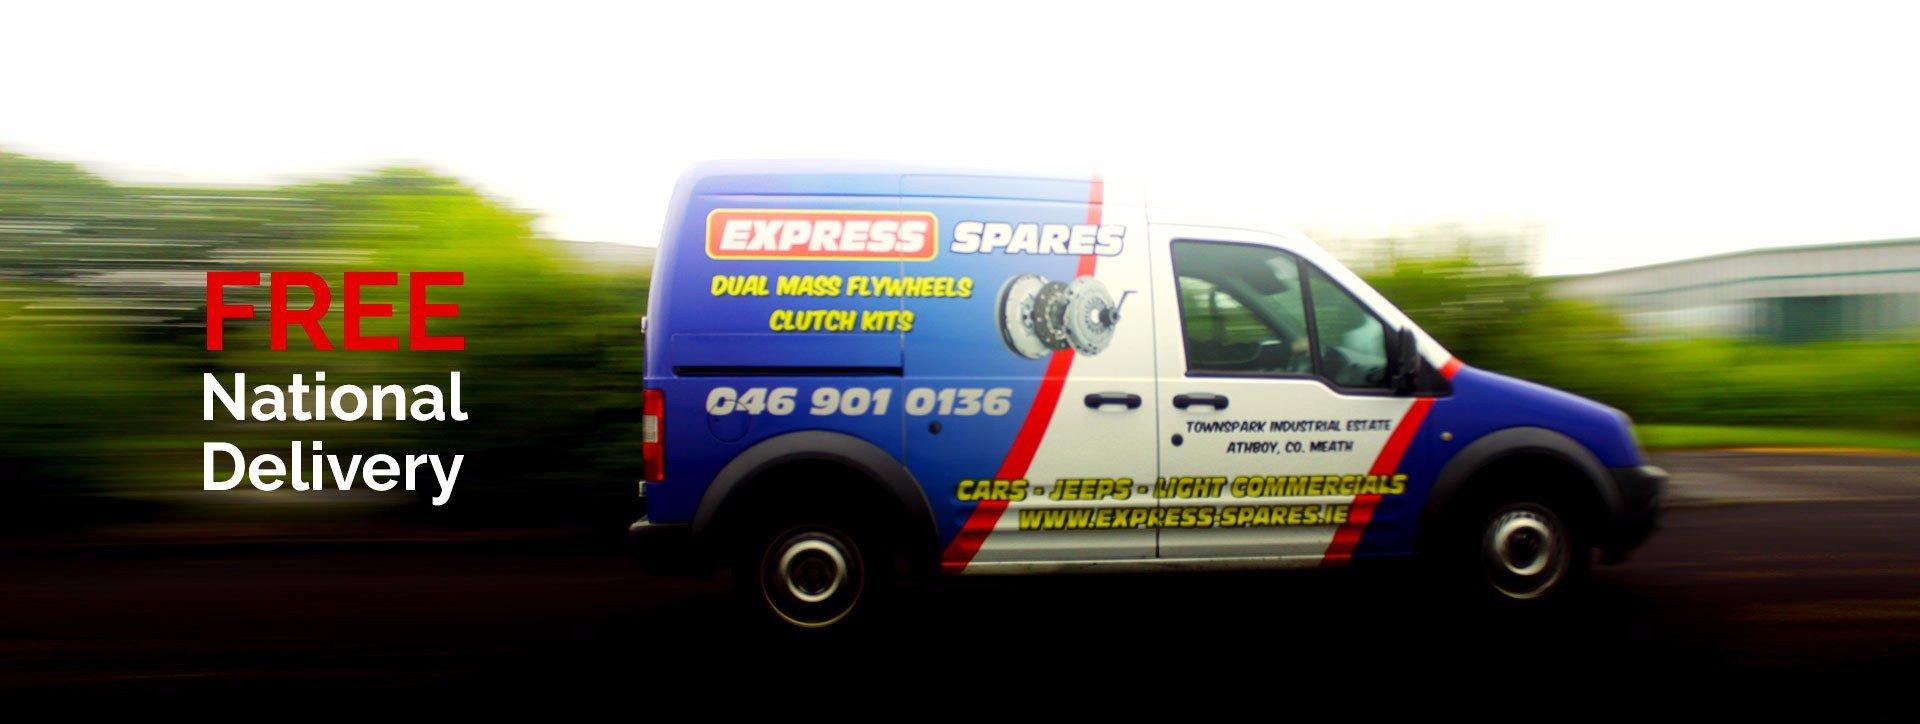 Express Spares